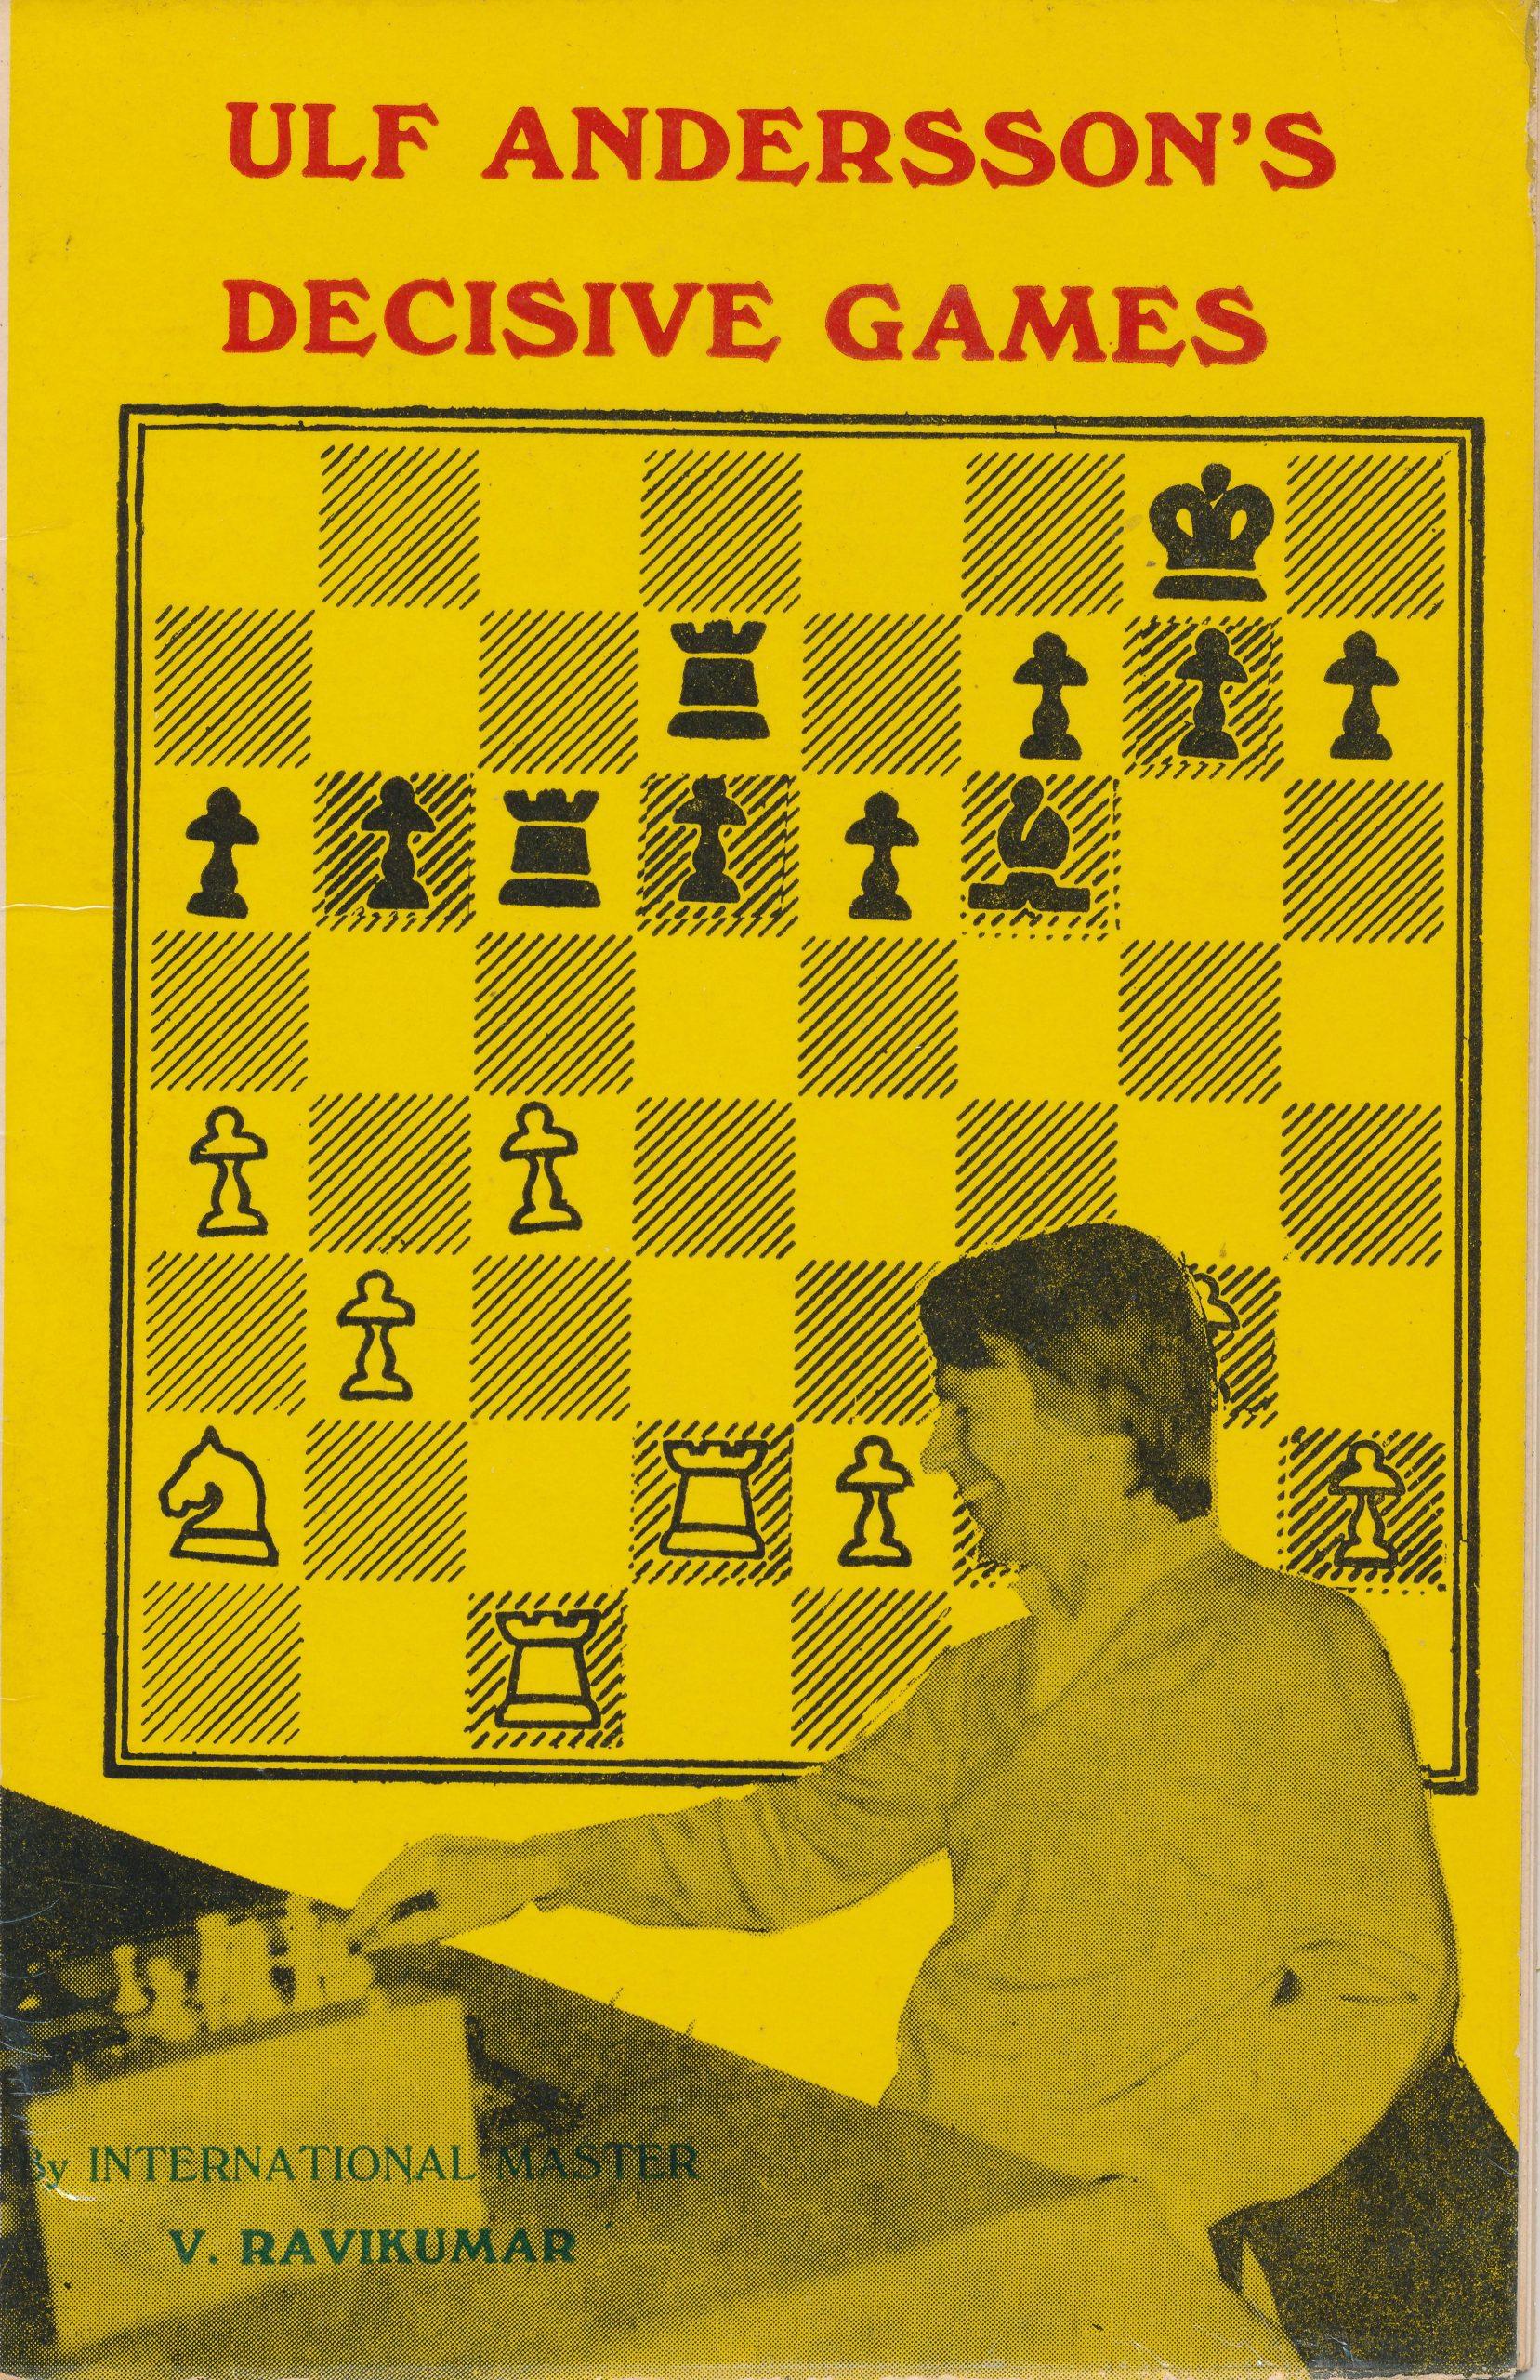 Ulf Andersson's Decisive Games, IM Vaidyanathan Ravikumar, Peja International, 1985.